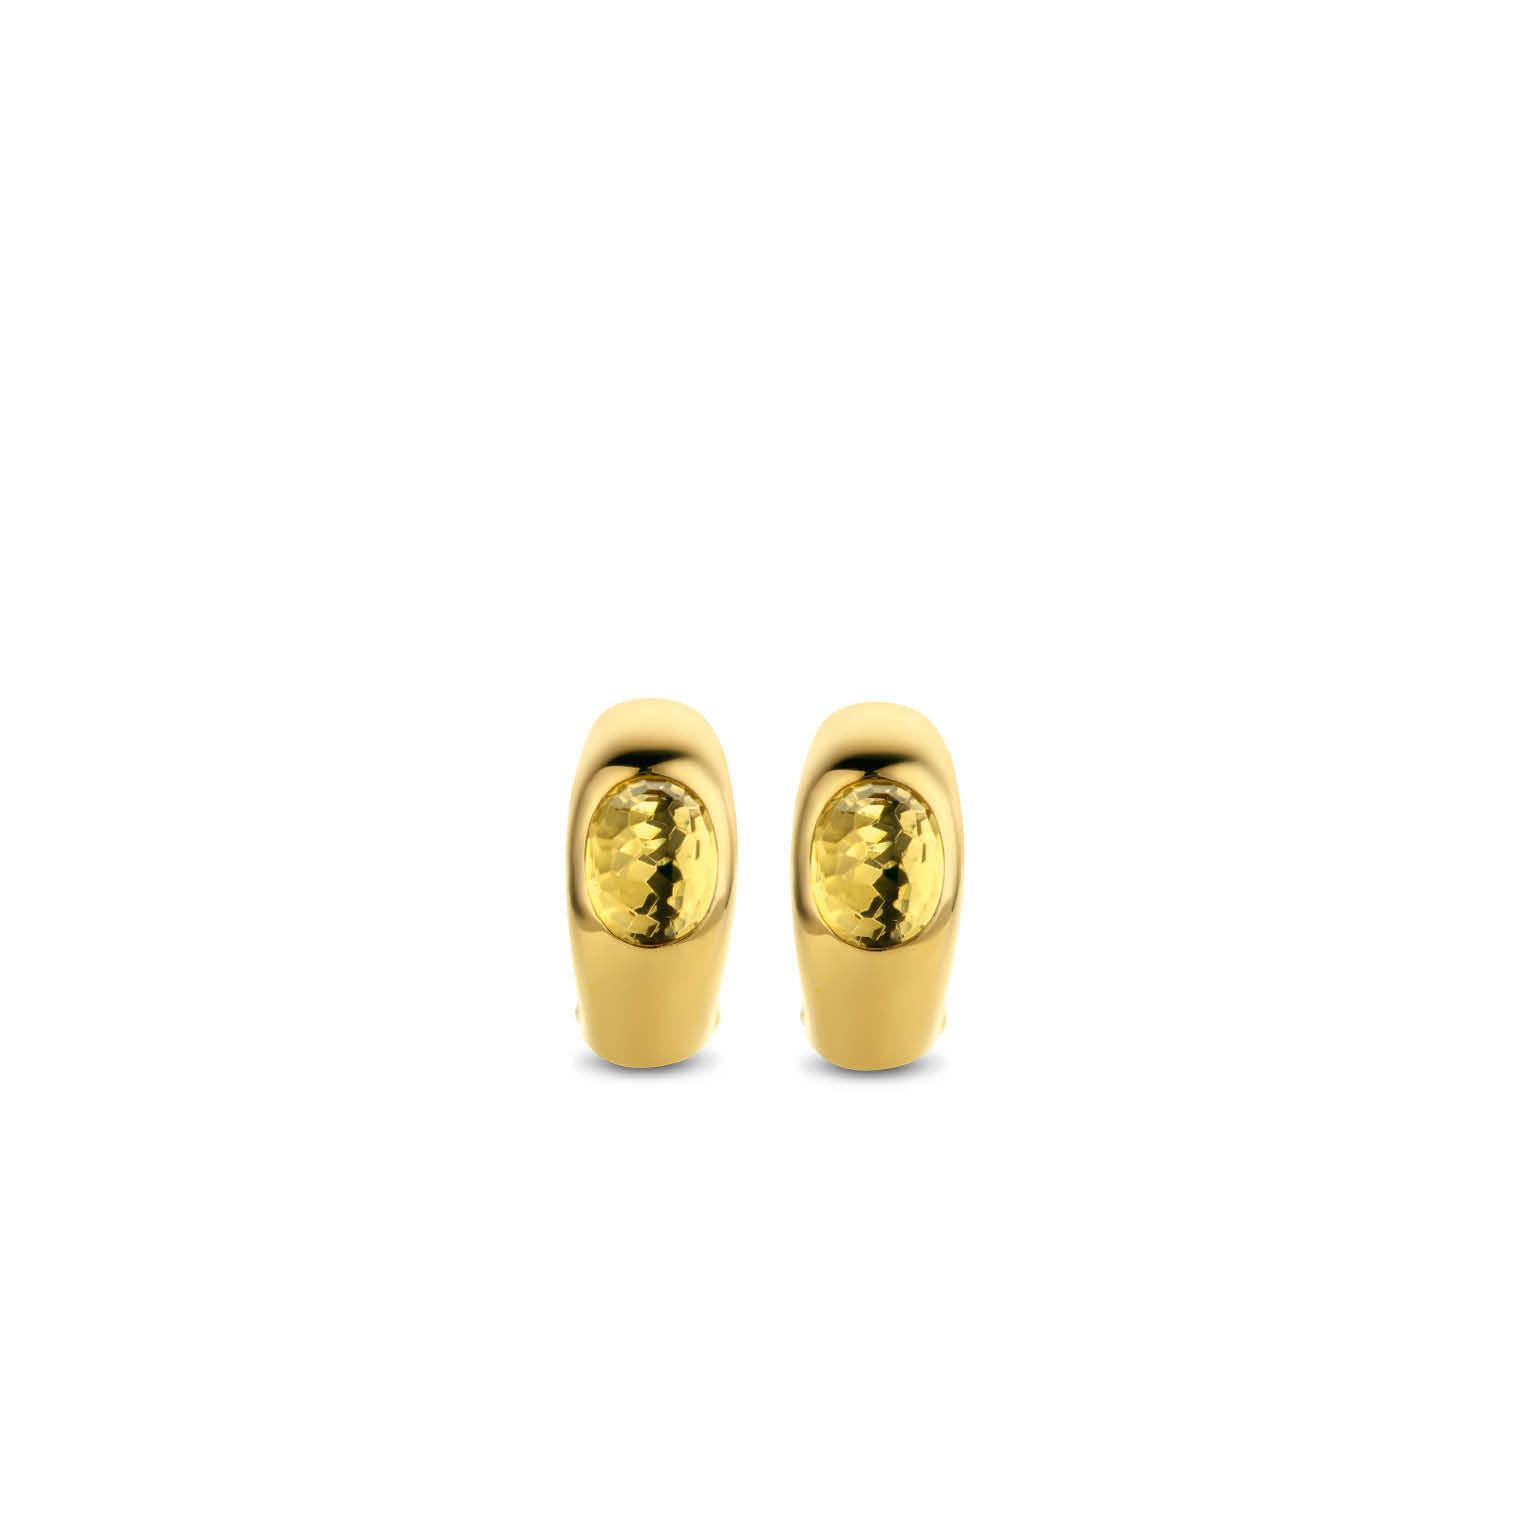 TI SENTO - Milano Earrings 7805TY-2